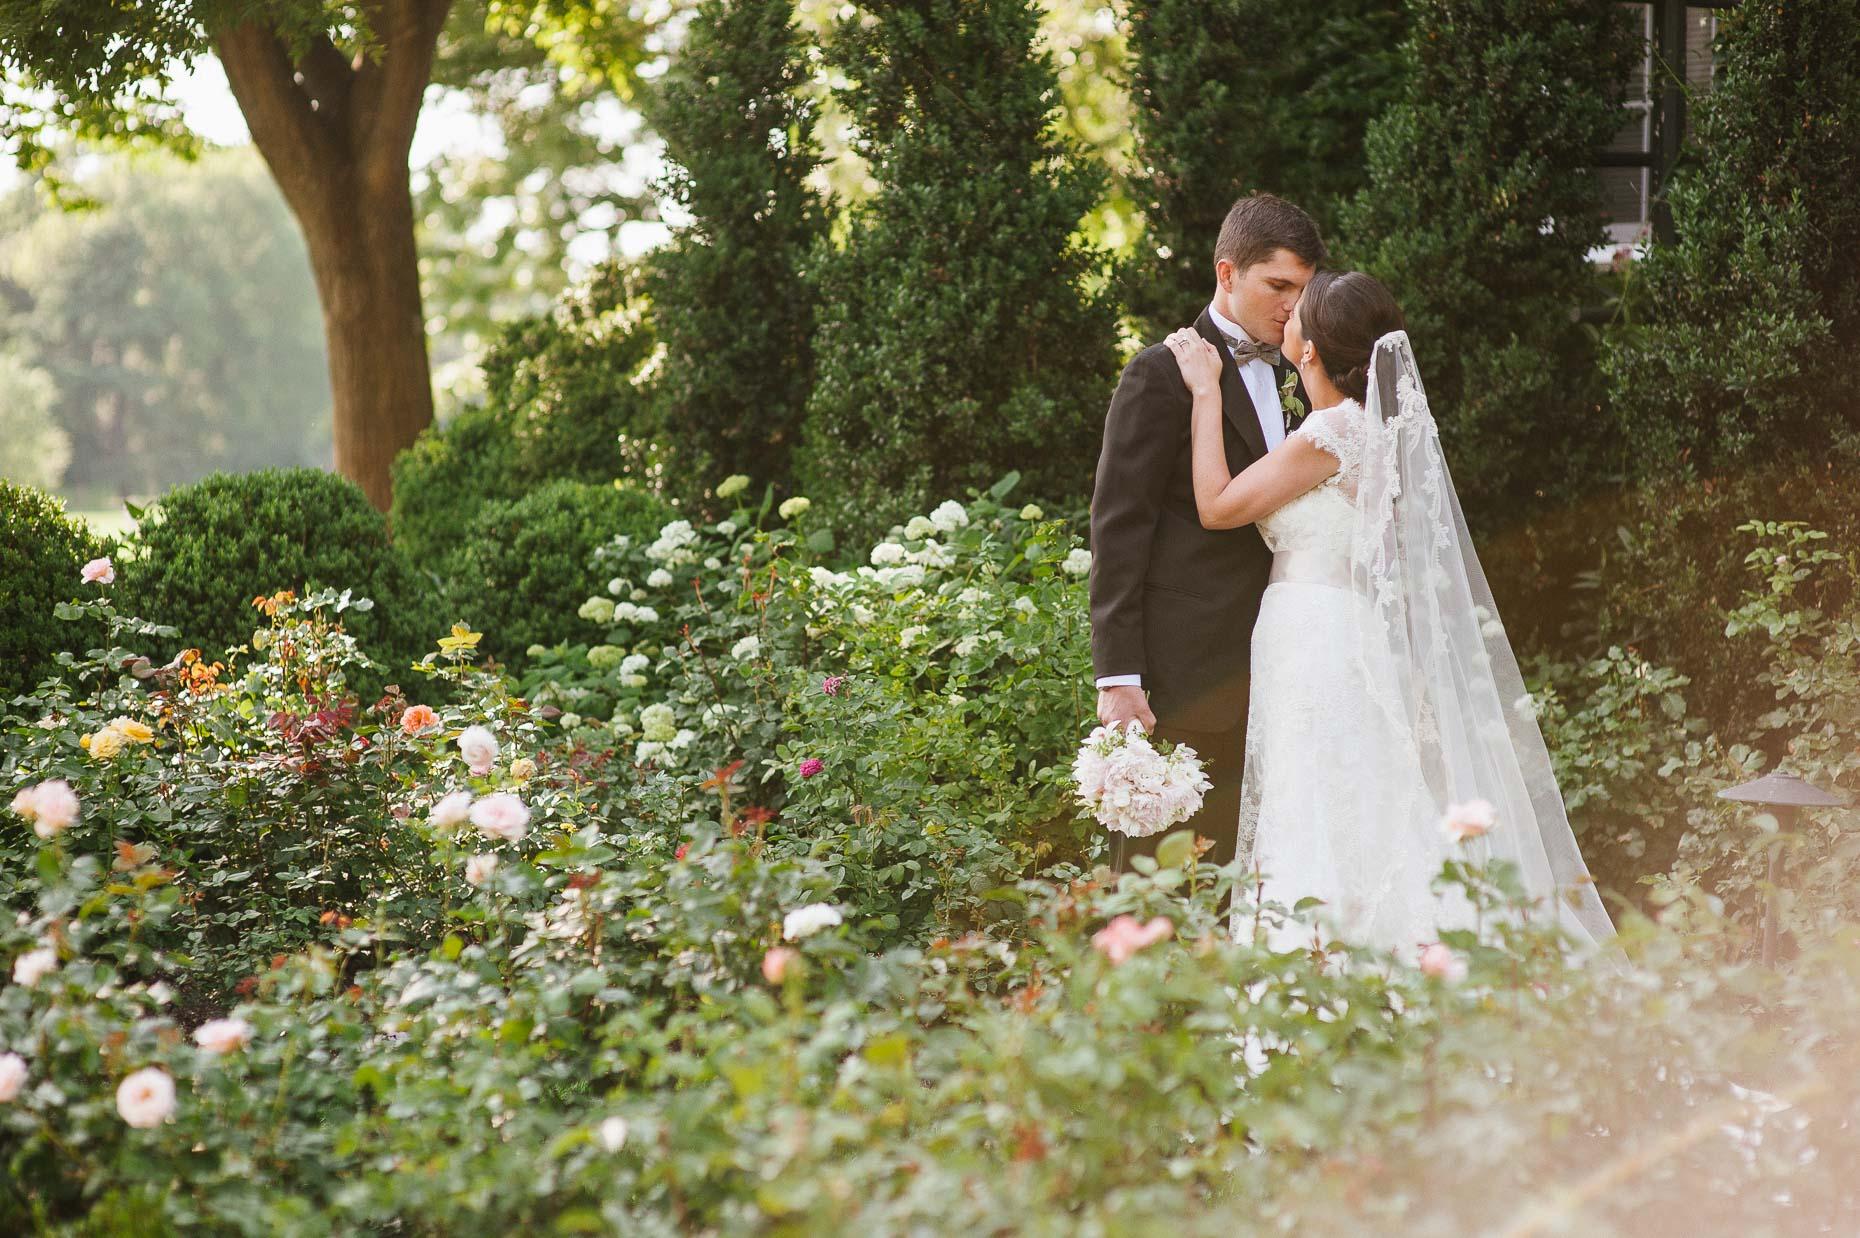 Weddings by Elliott O'Donovan - Washington DC_-13.jpg